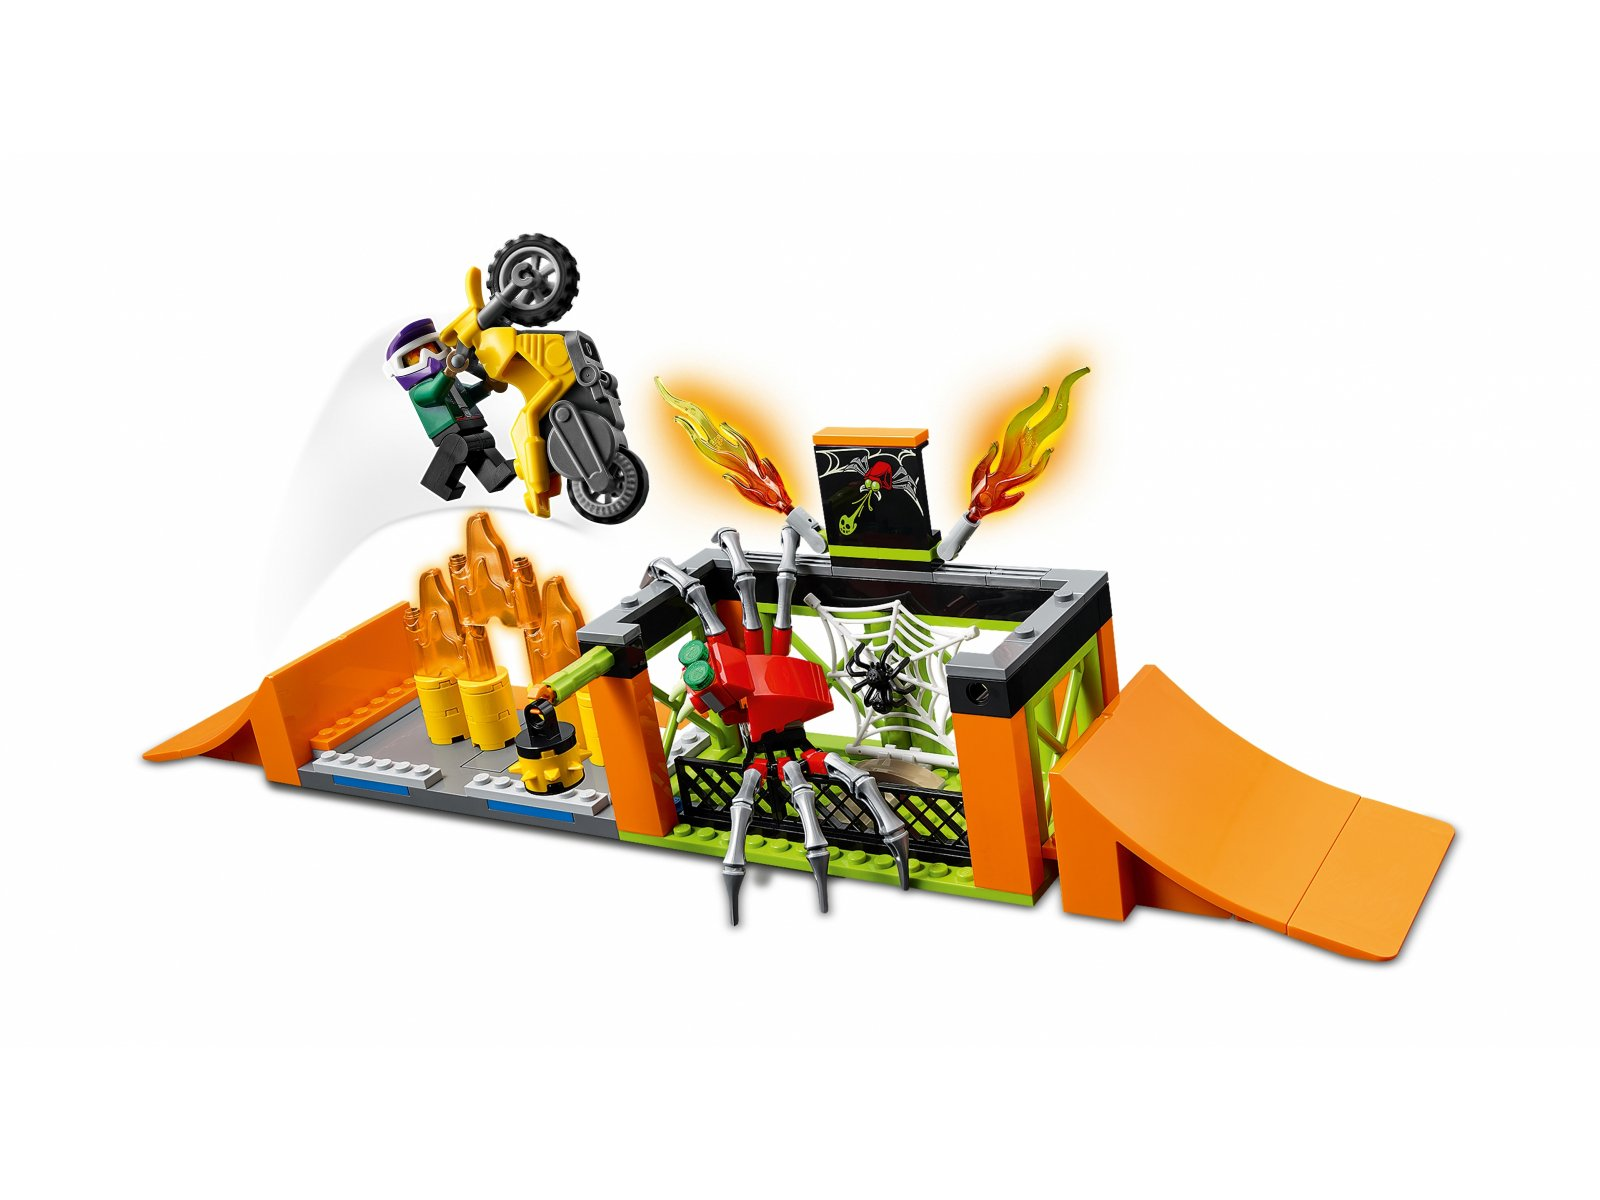 LEGO 60293 Park kaskaderski